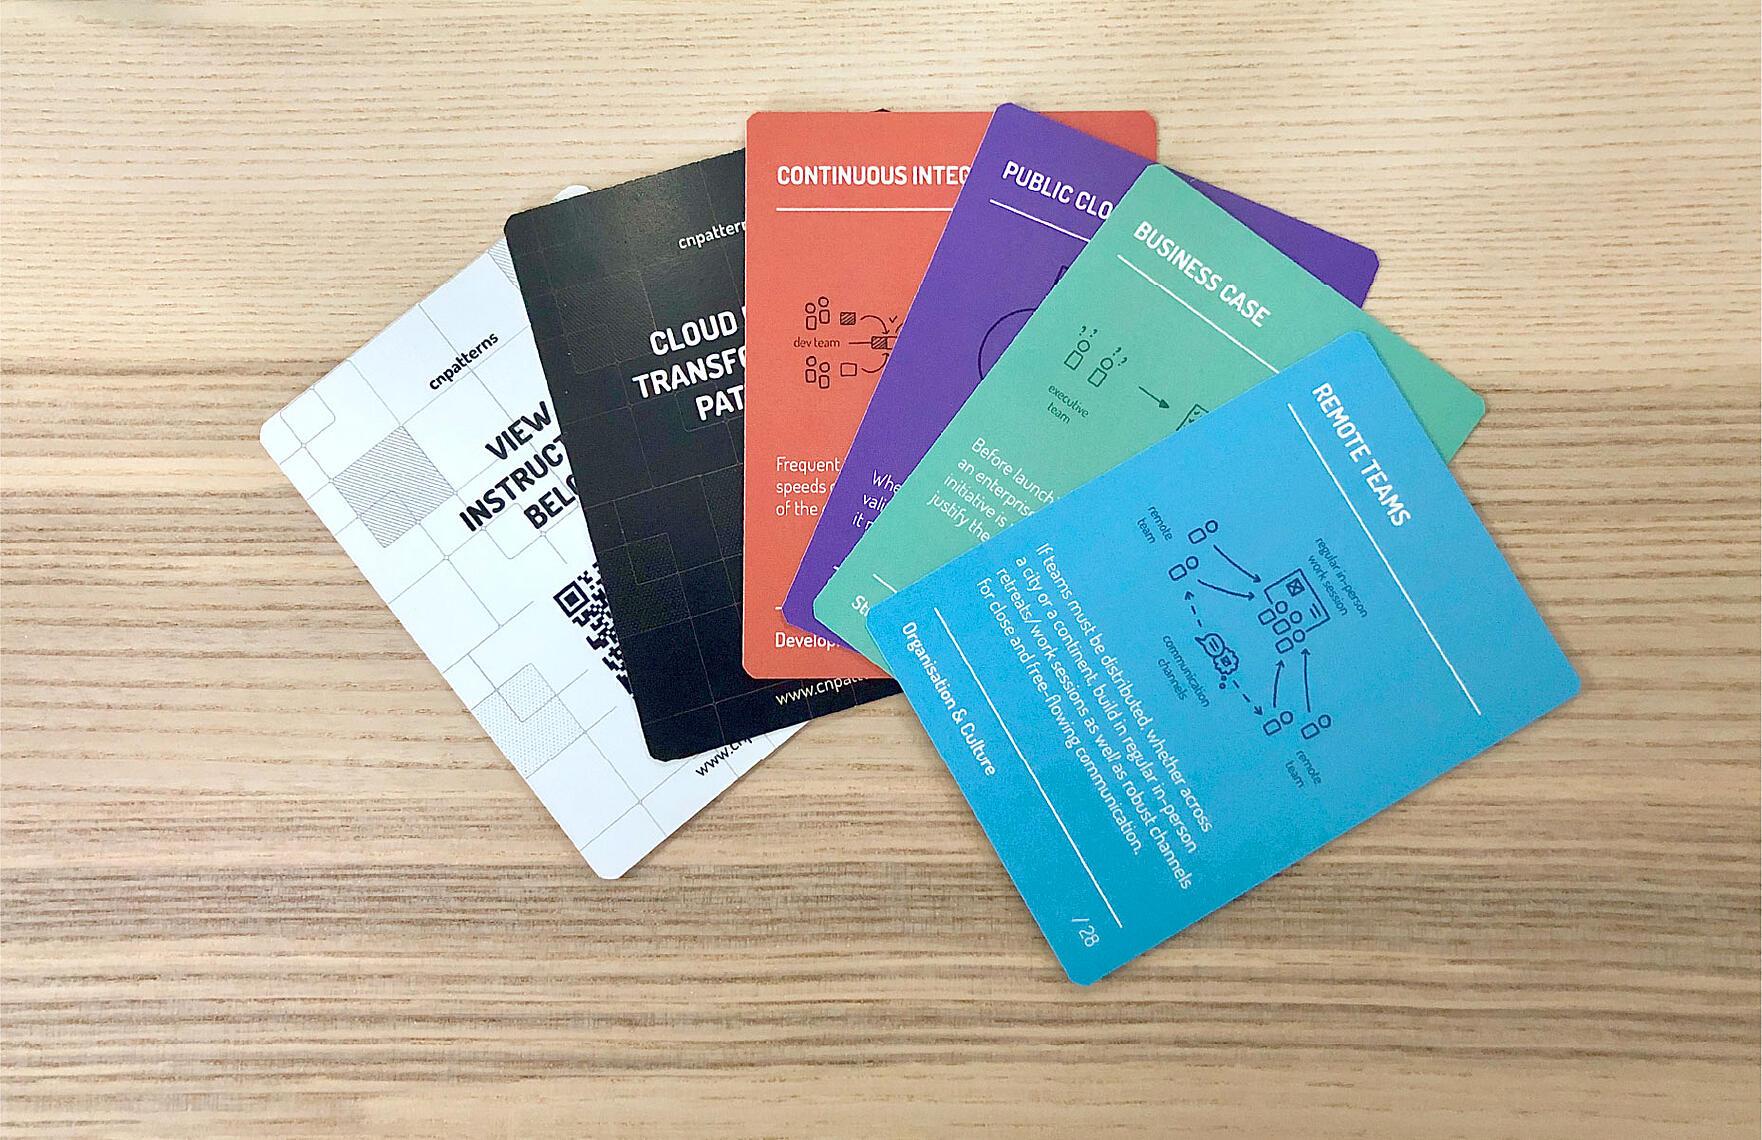 cnt-cardsworkshop-copy-1